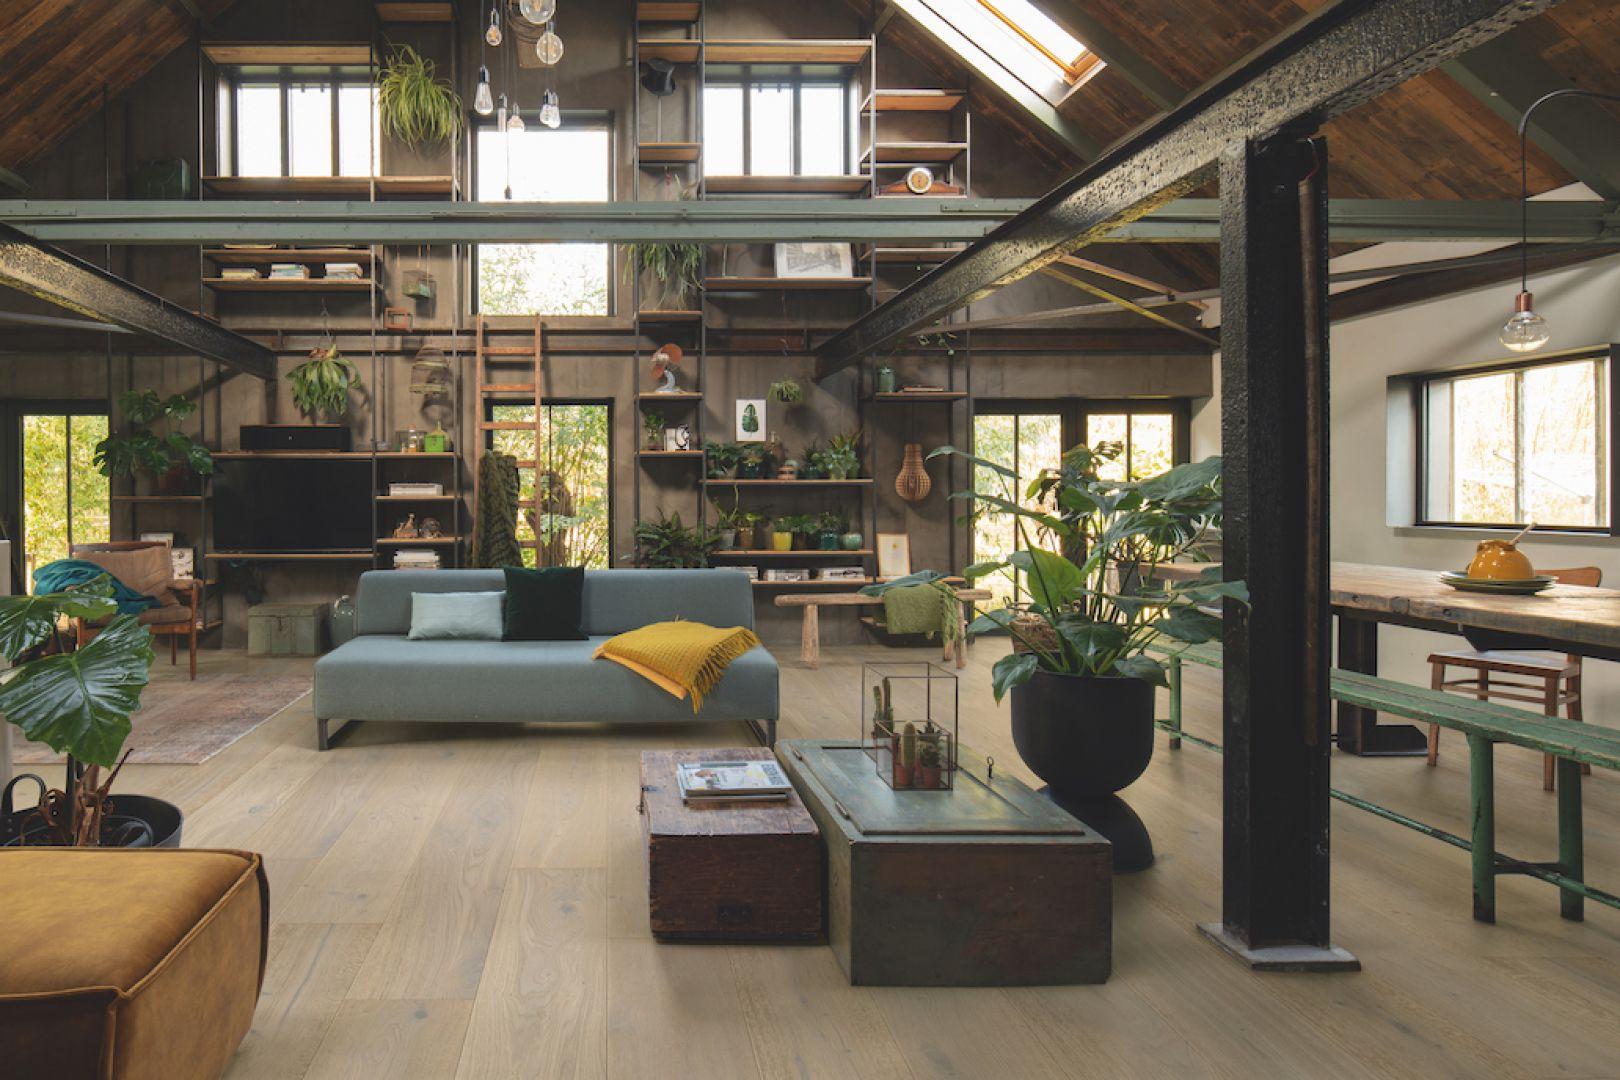 Podłogi drewniane - nowa technologia lakierowania Quick-Step Wood for Life. Fot. Quick-Step